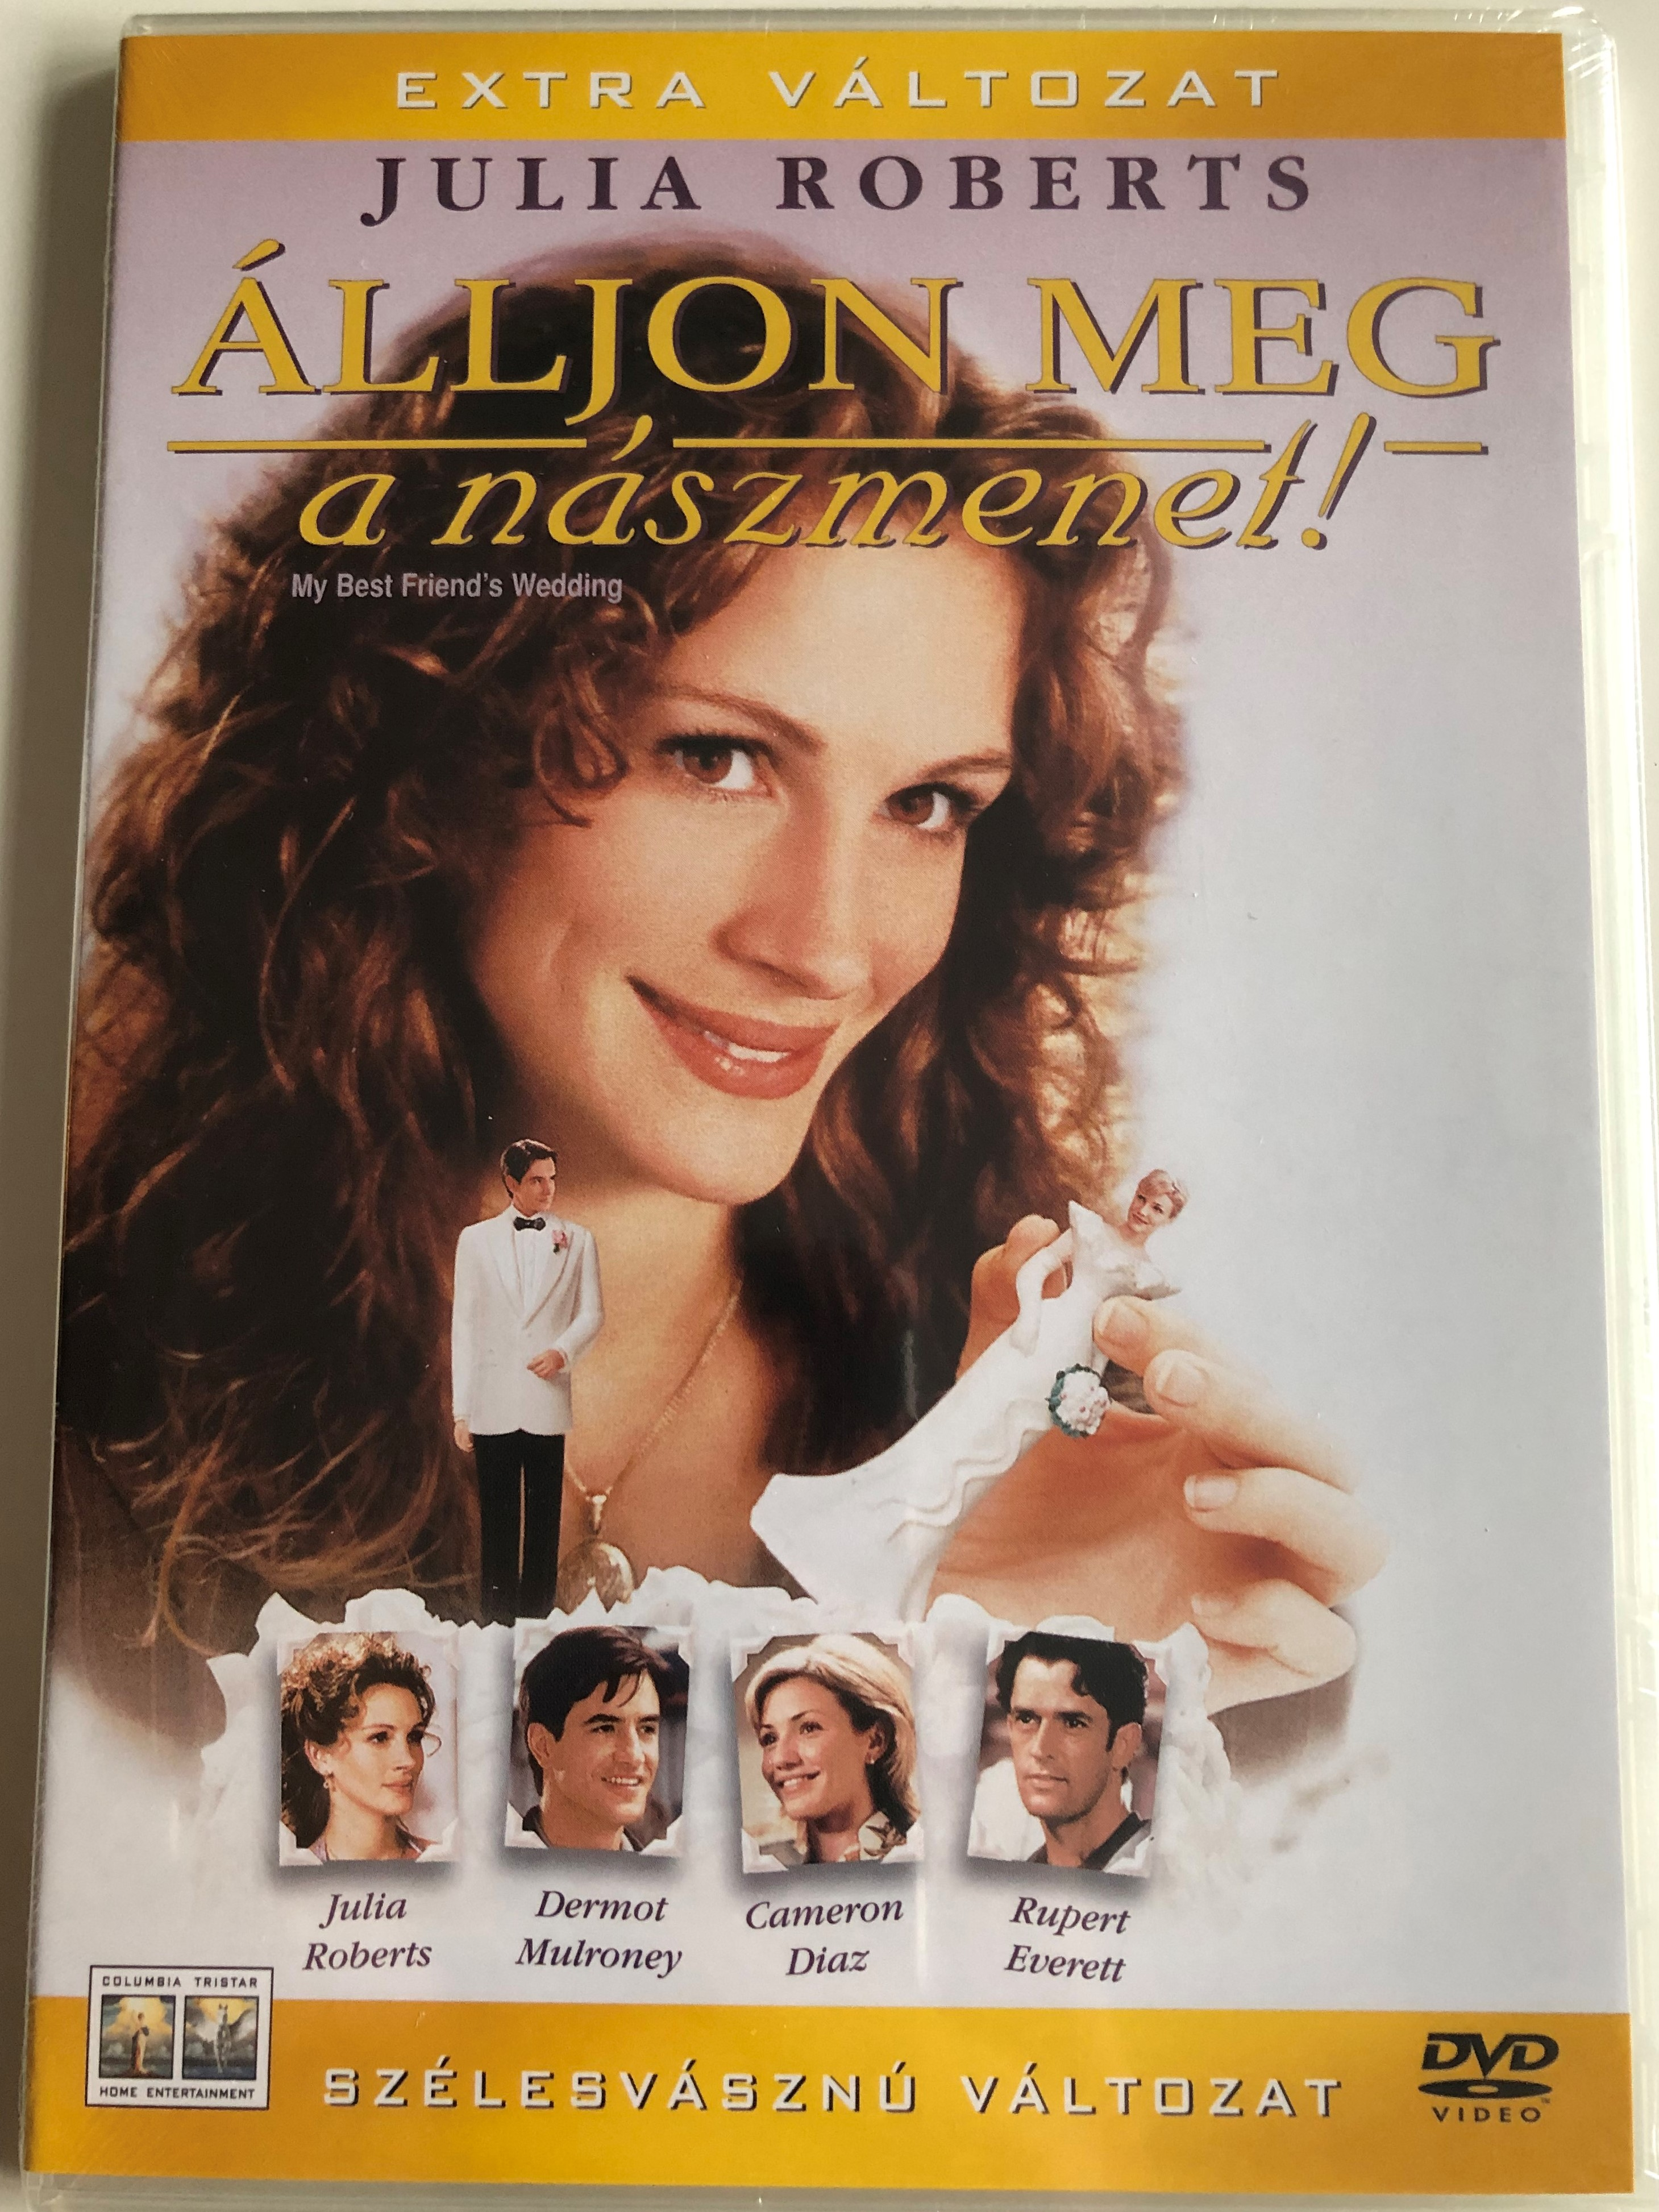 my-best-friend-s-wedding-dvd-1997-lljon-meg-a-n-szmenet-1.jpg